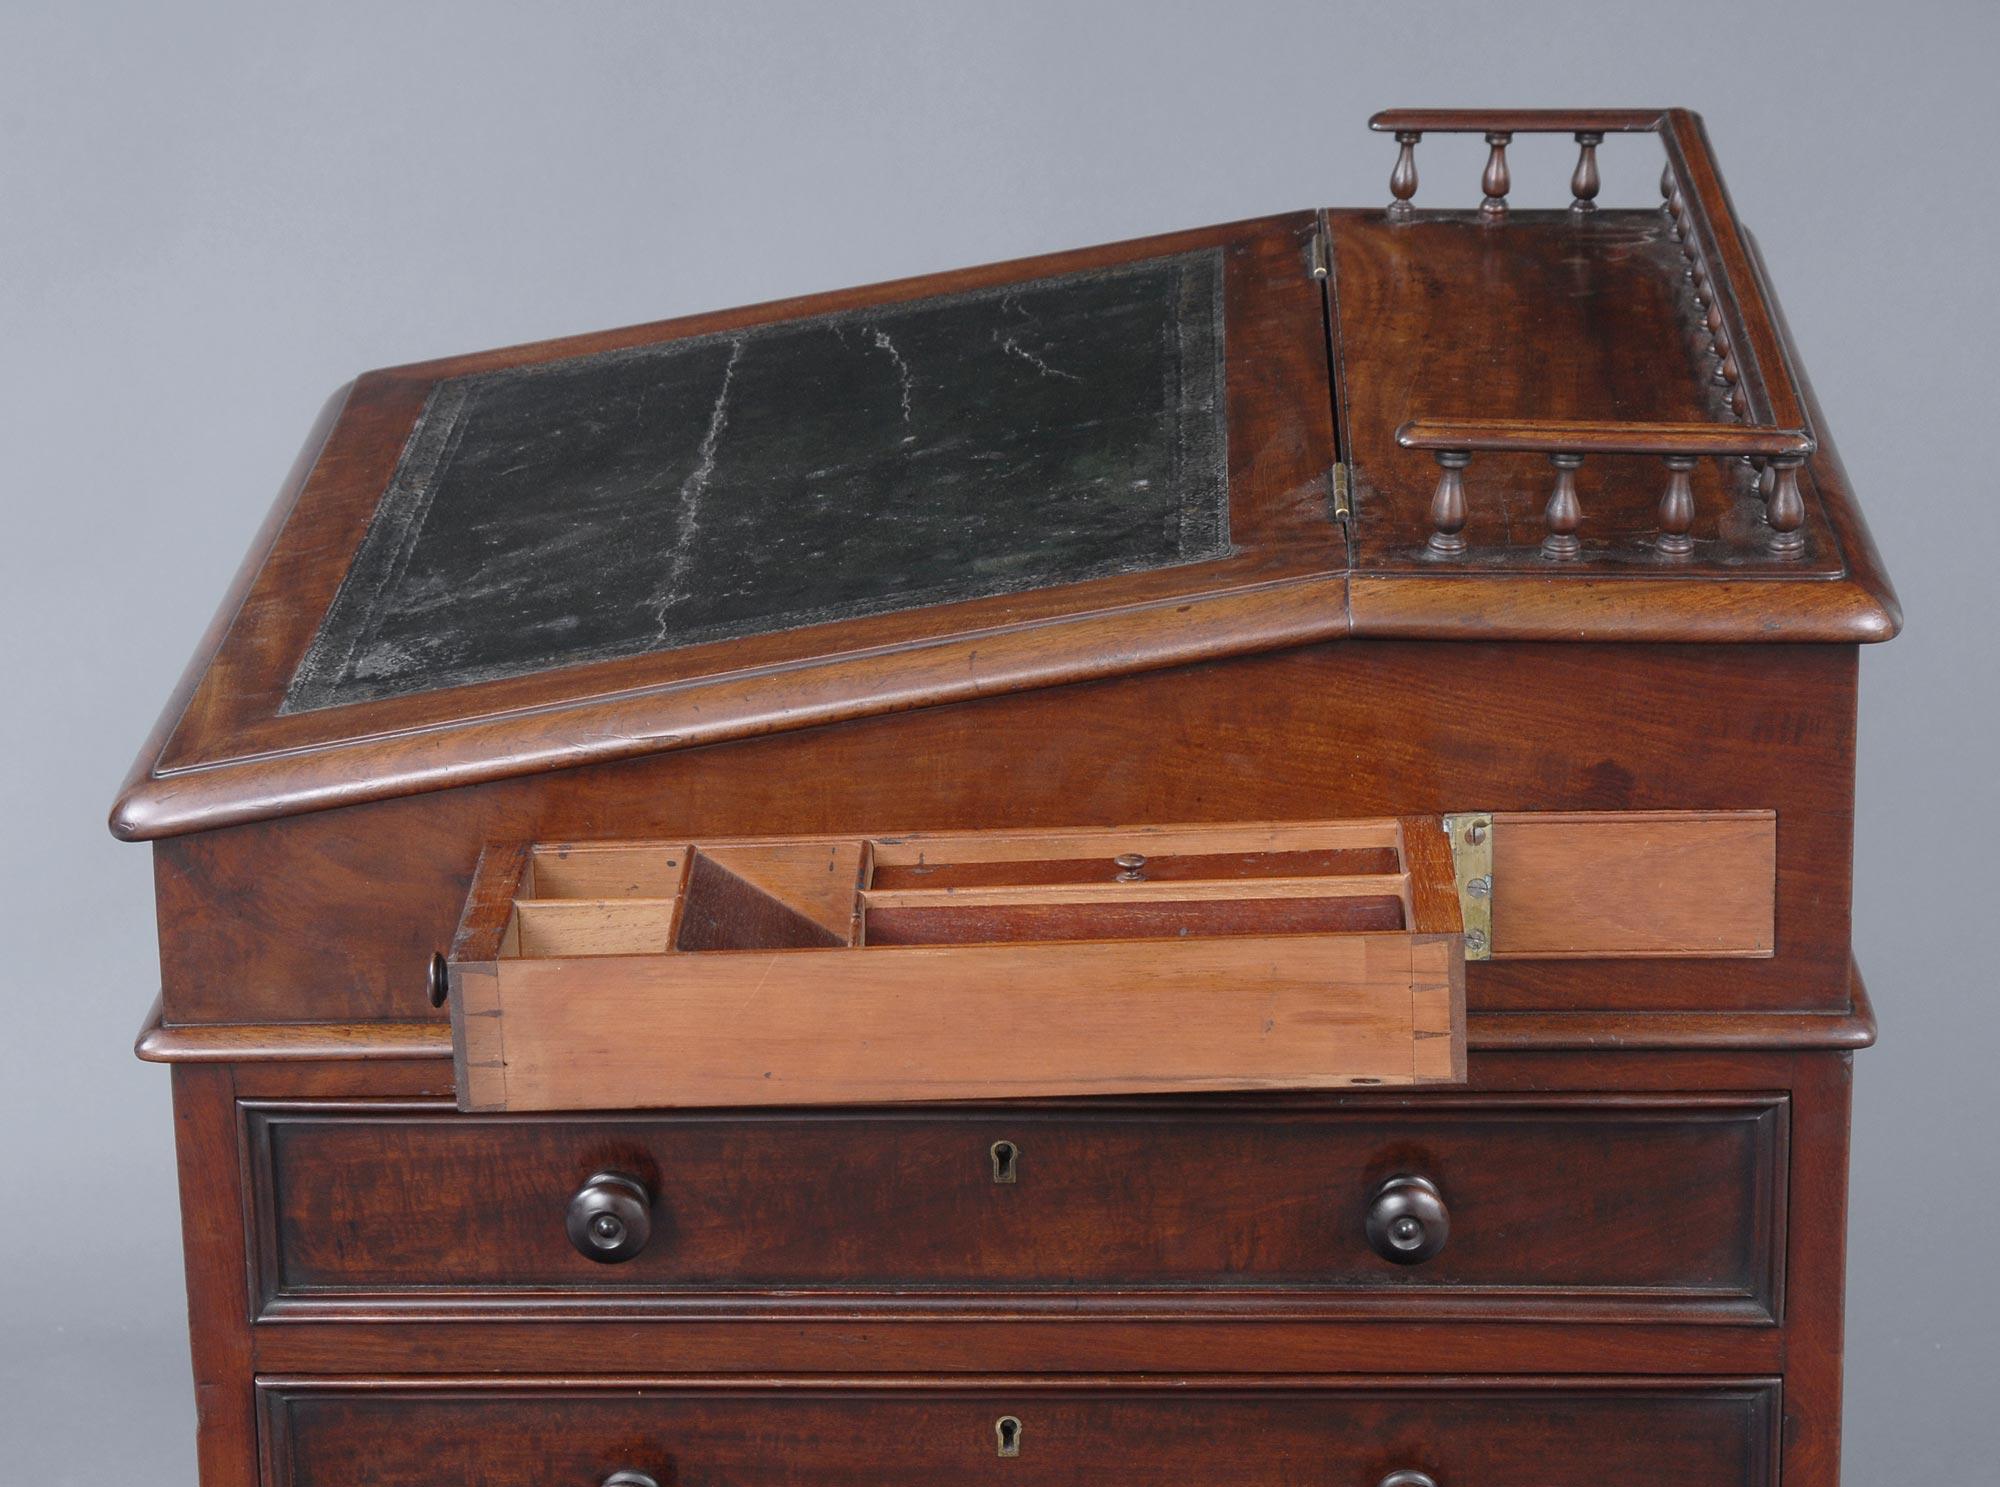 English Late Regency Davenport Antique Gany Desk